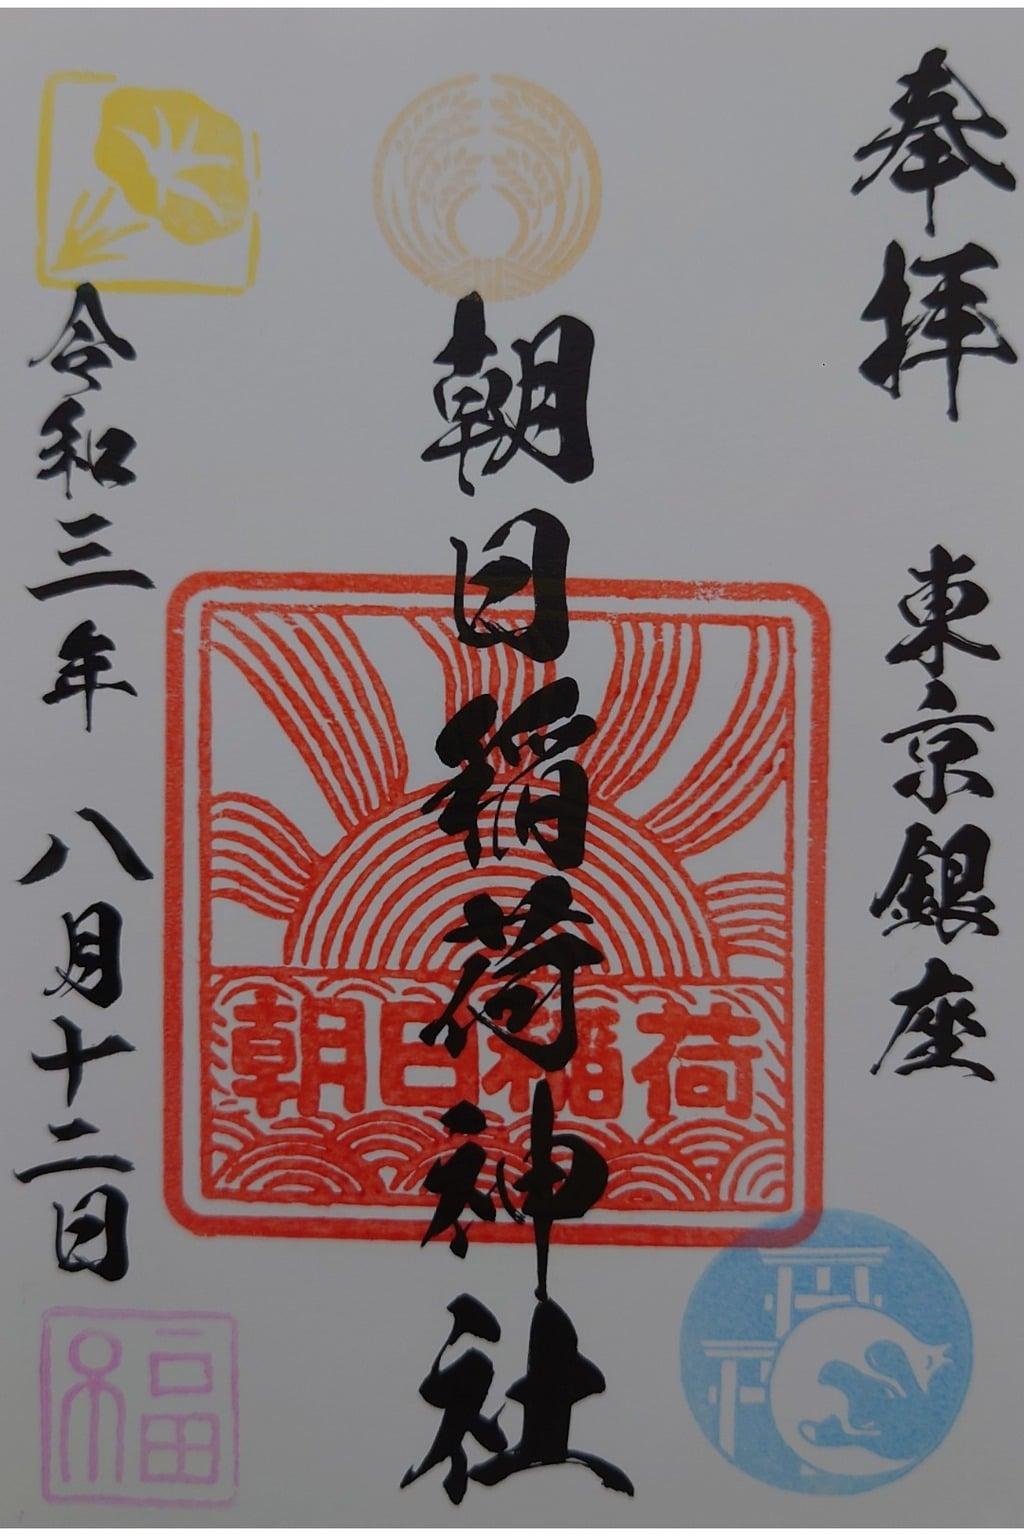 朝日稲荷神社の御朱印